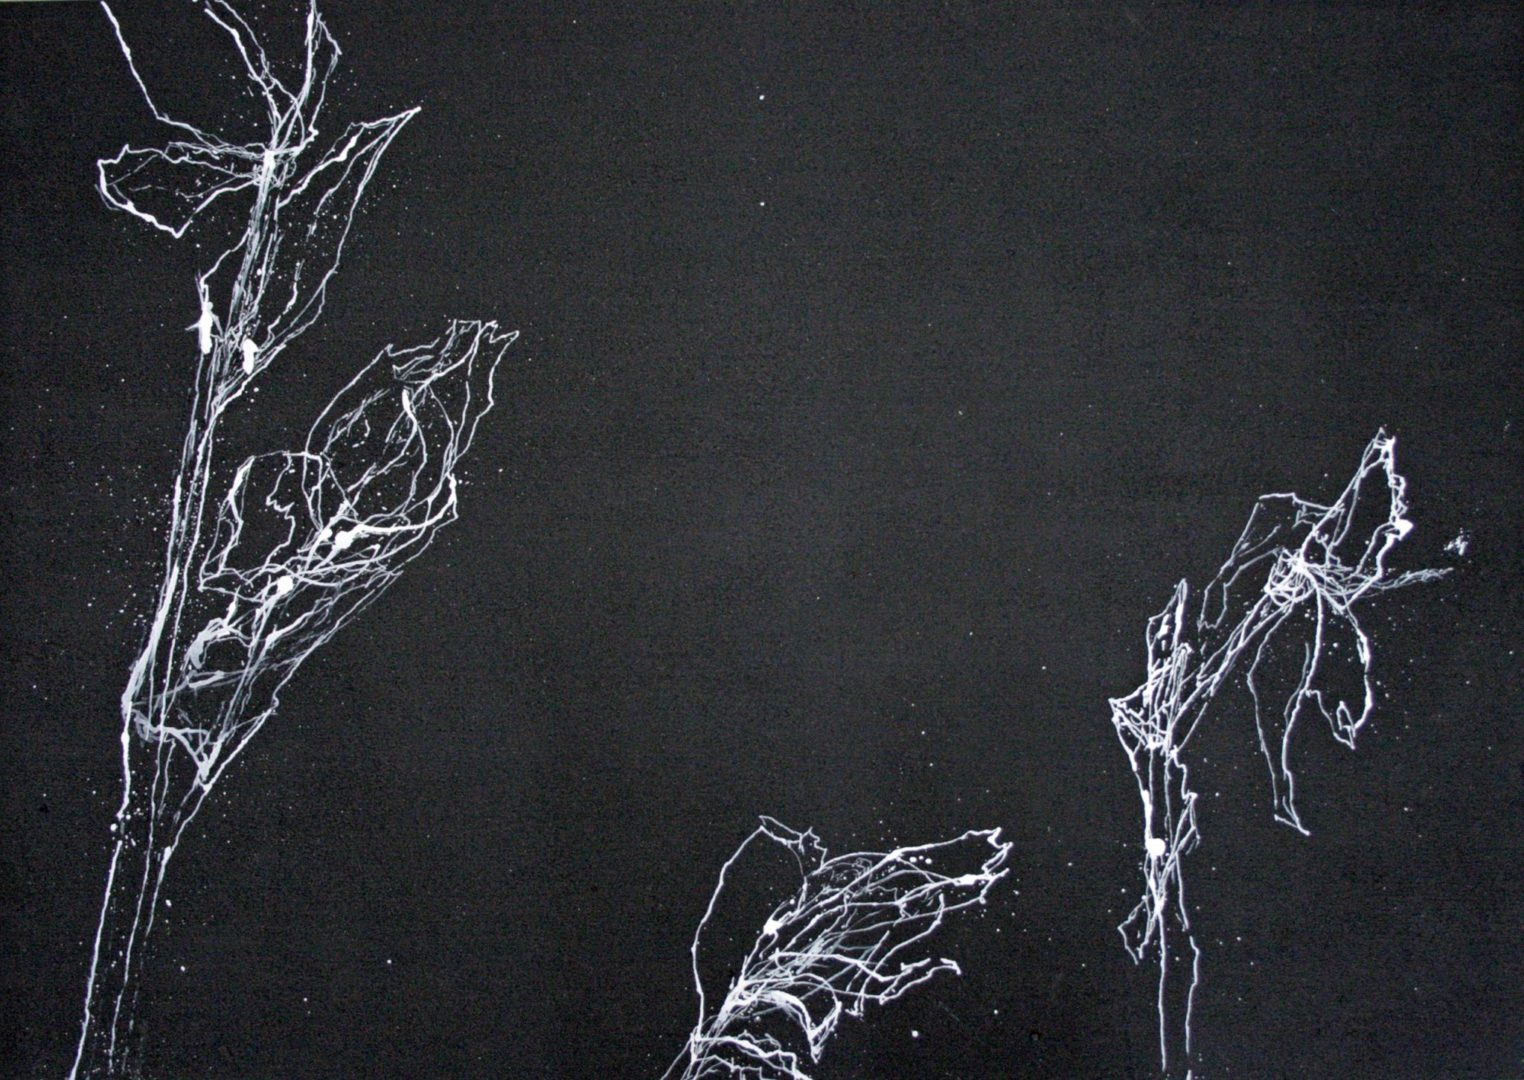 Iris III - Acryl Lasur auf Papier, 50 x 70 cm, 2014 ©Ursula Heermann-Jensen